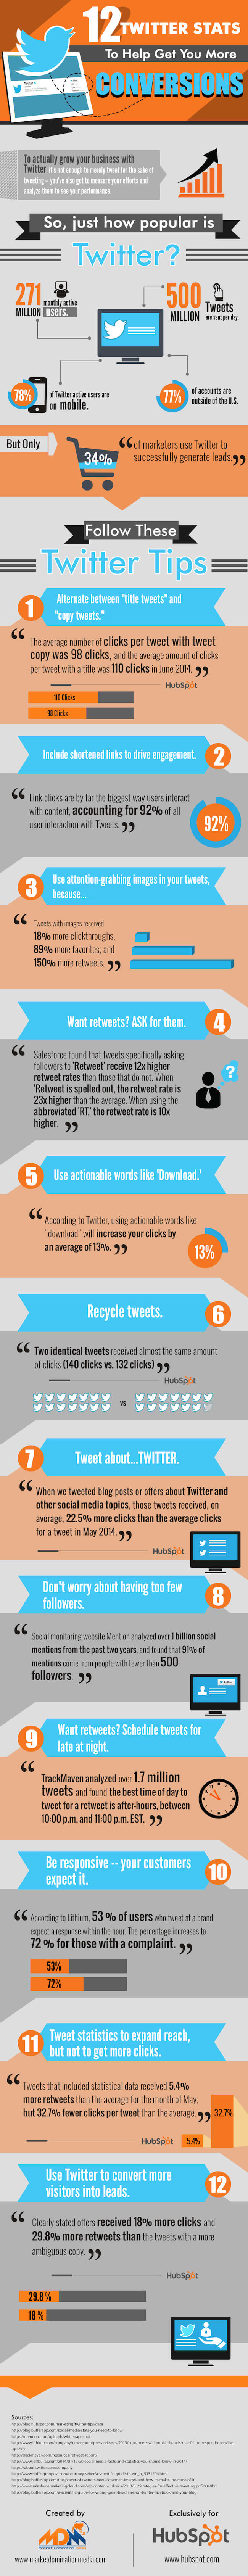 12-Twitter-Stats